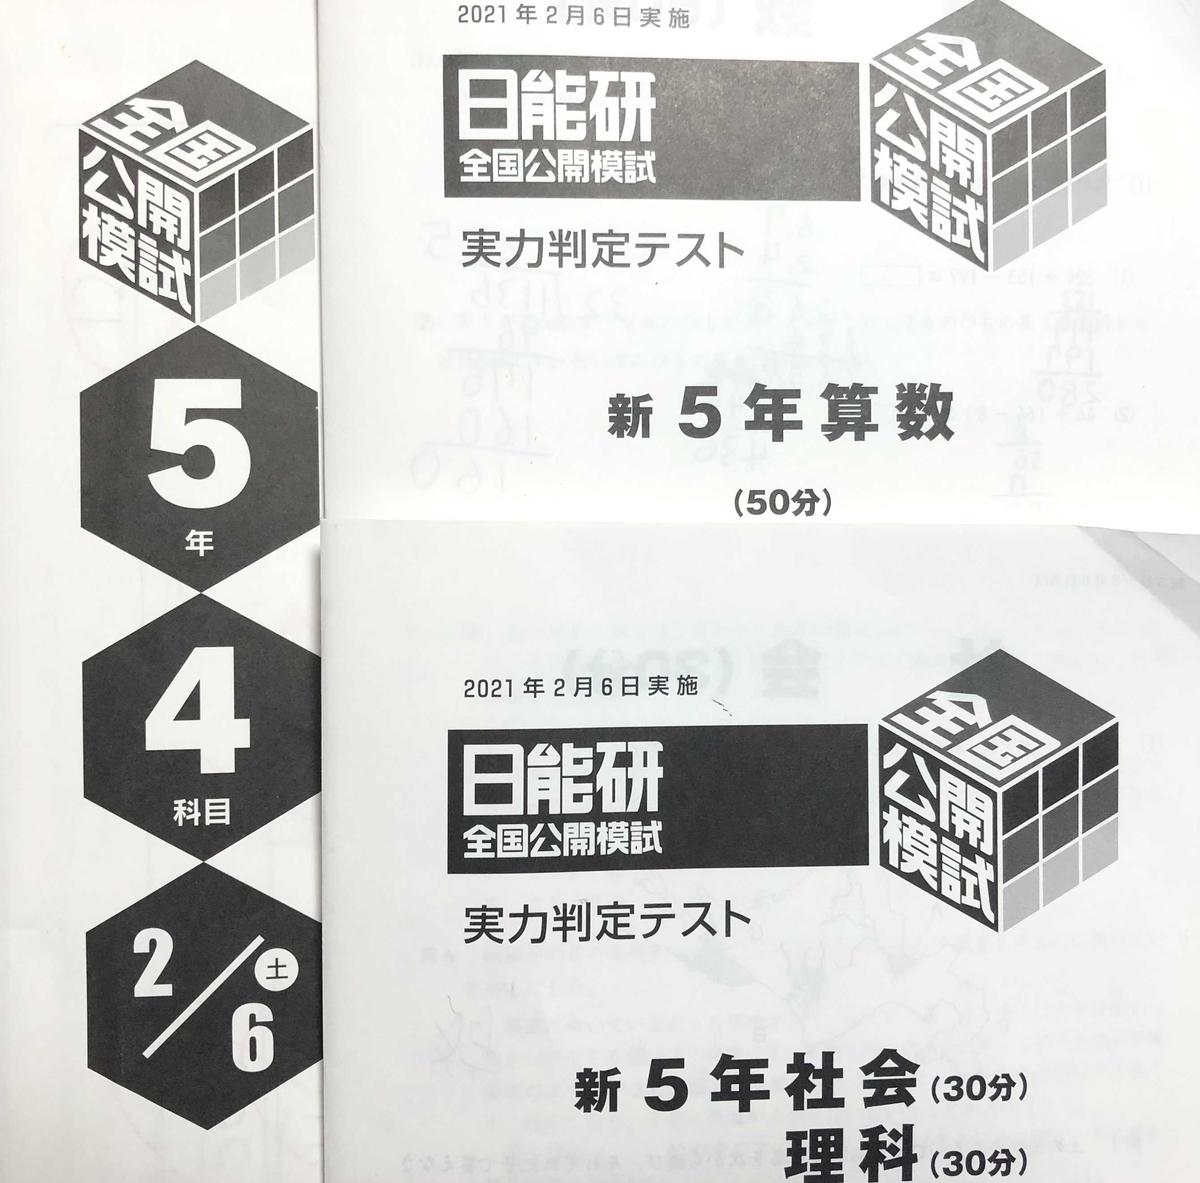 f:id:sakurako-tulipko:20210208103137j:plain